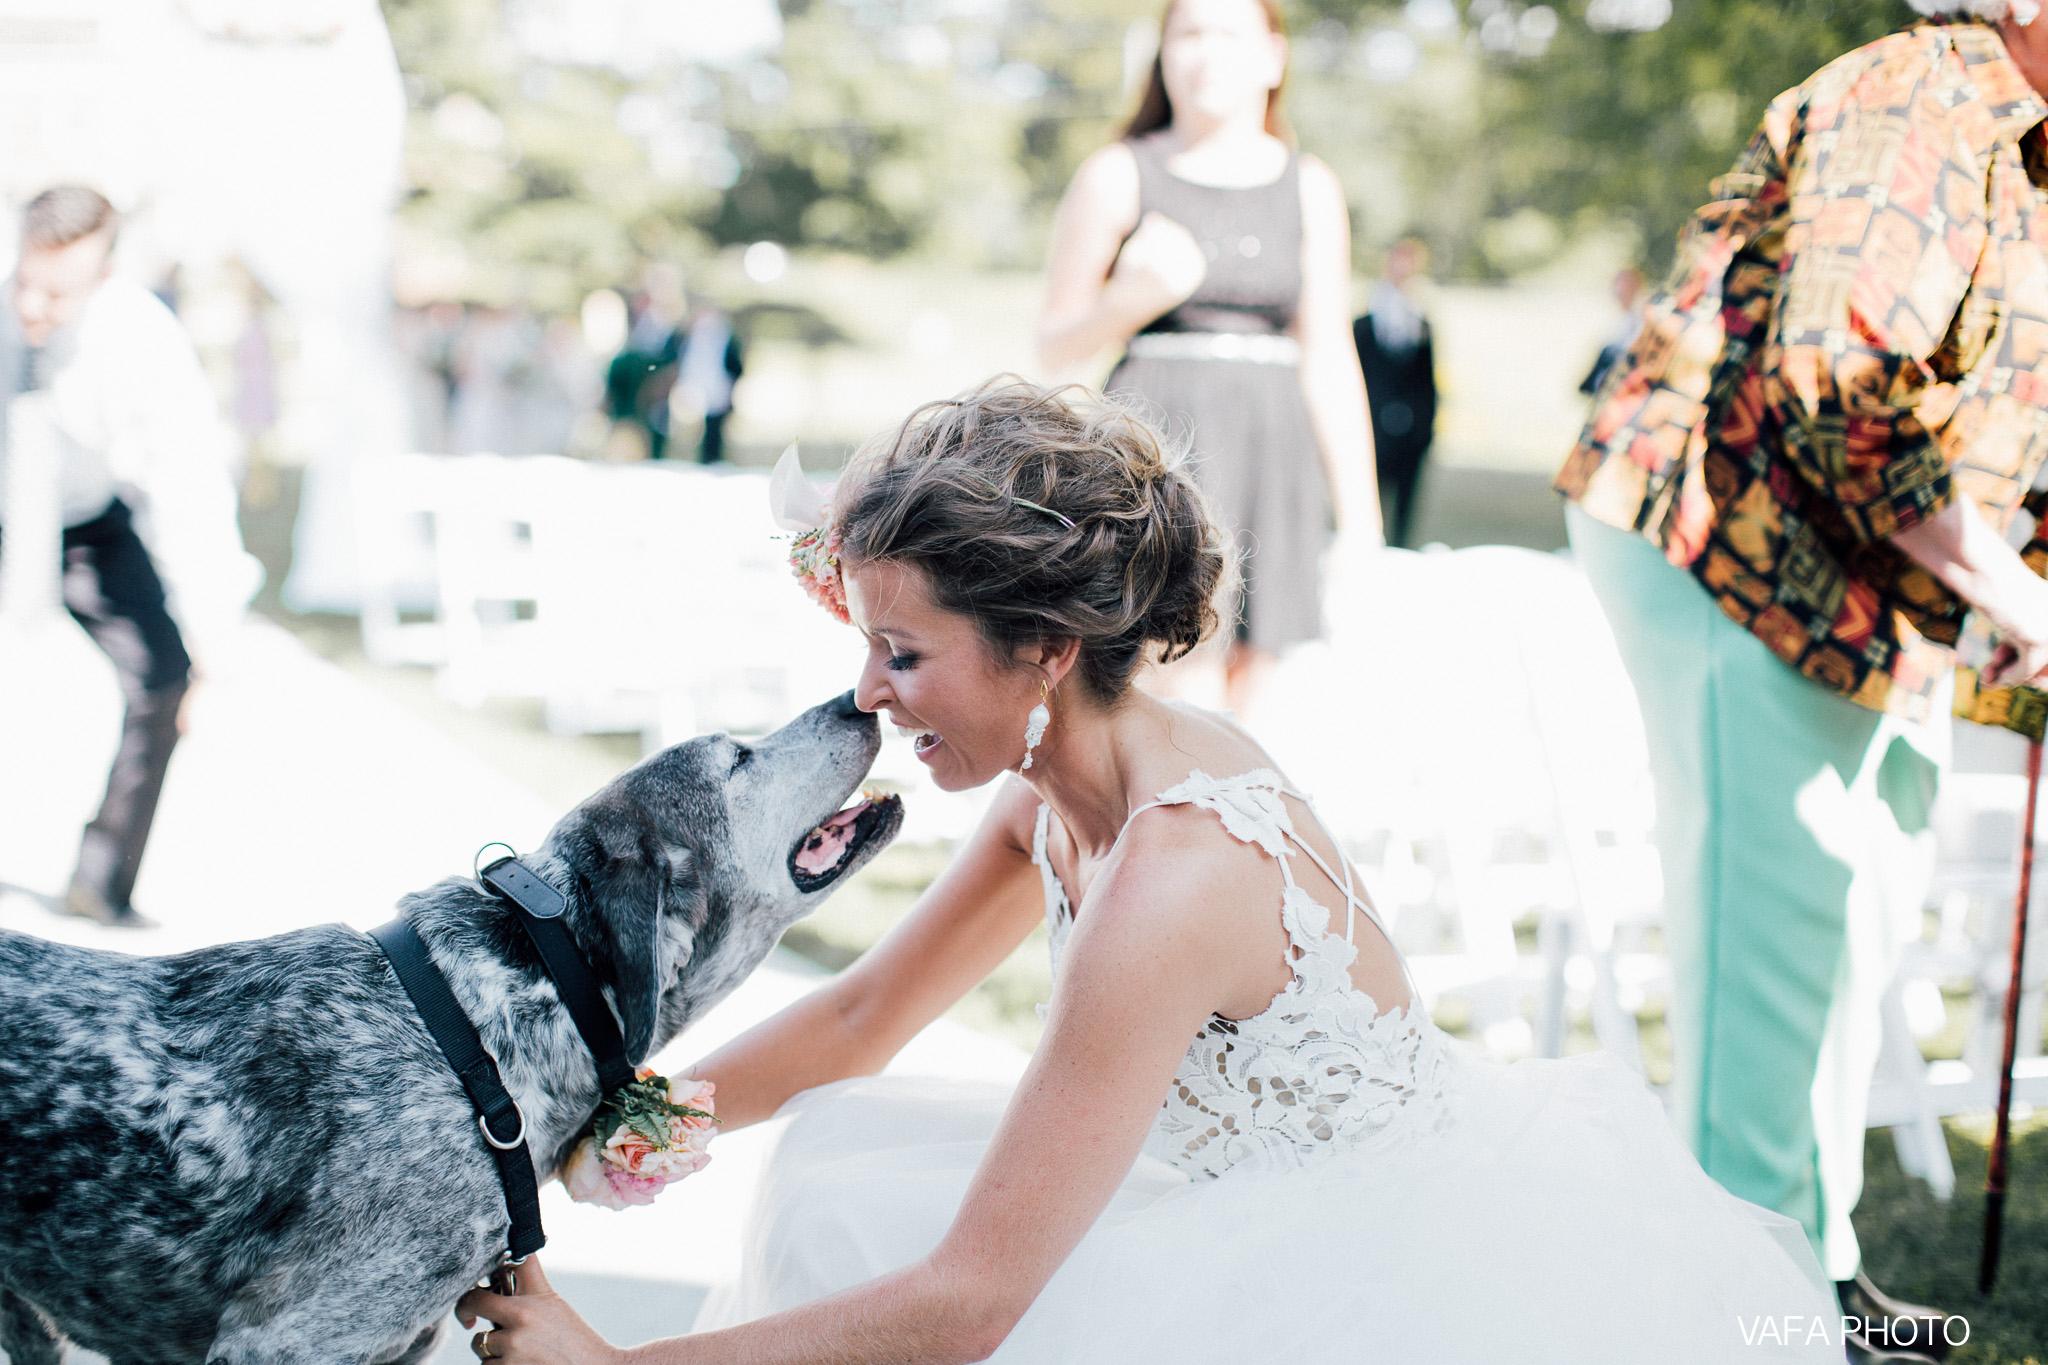 The-Felt-Estate-Wedding-Kailie-David-Vafa-Photo-443.jpg